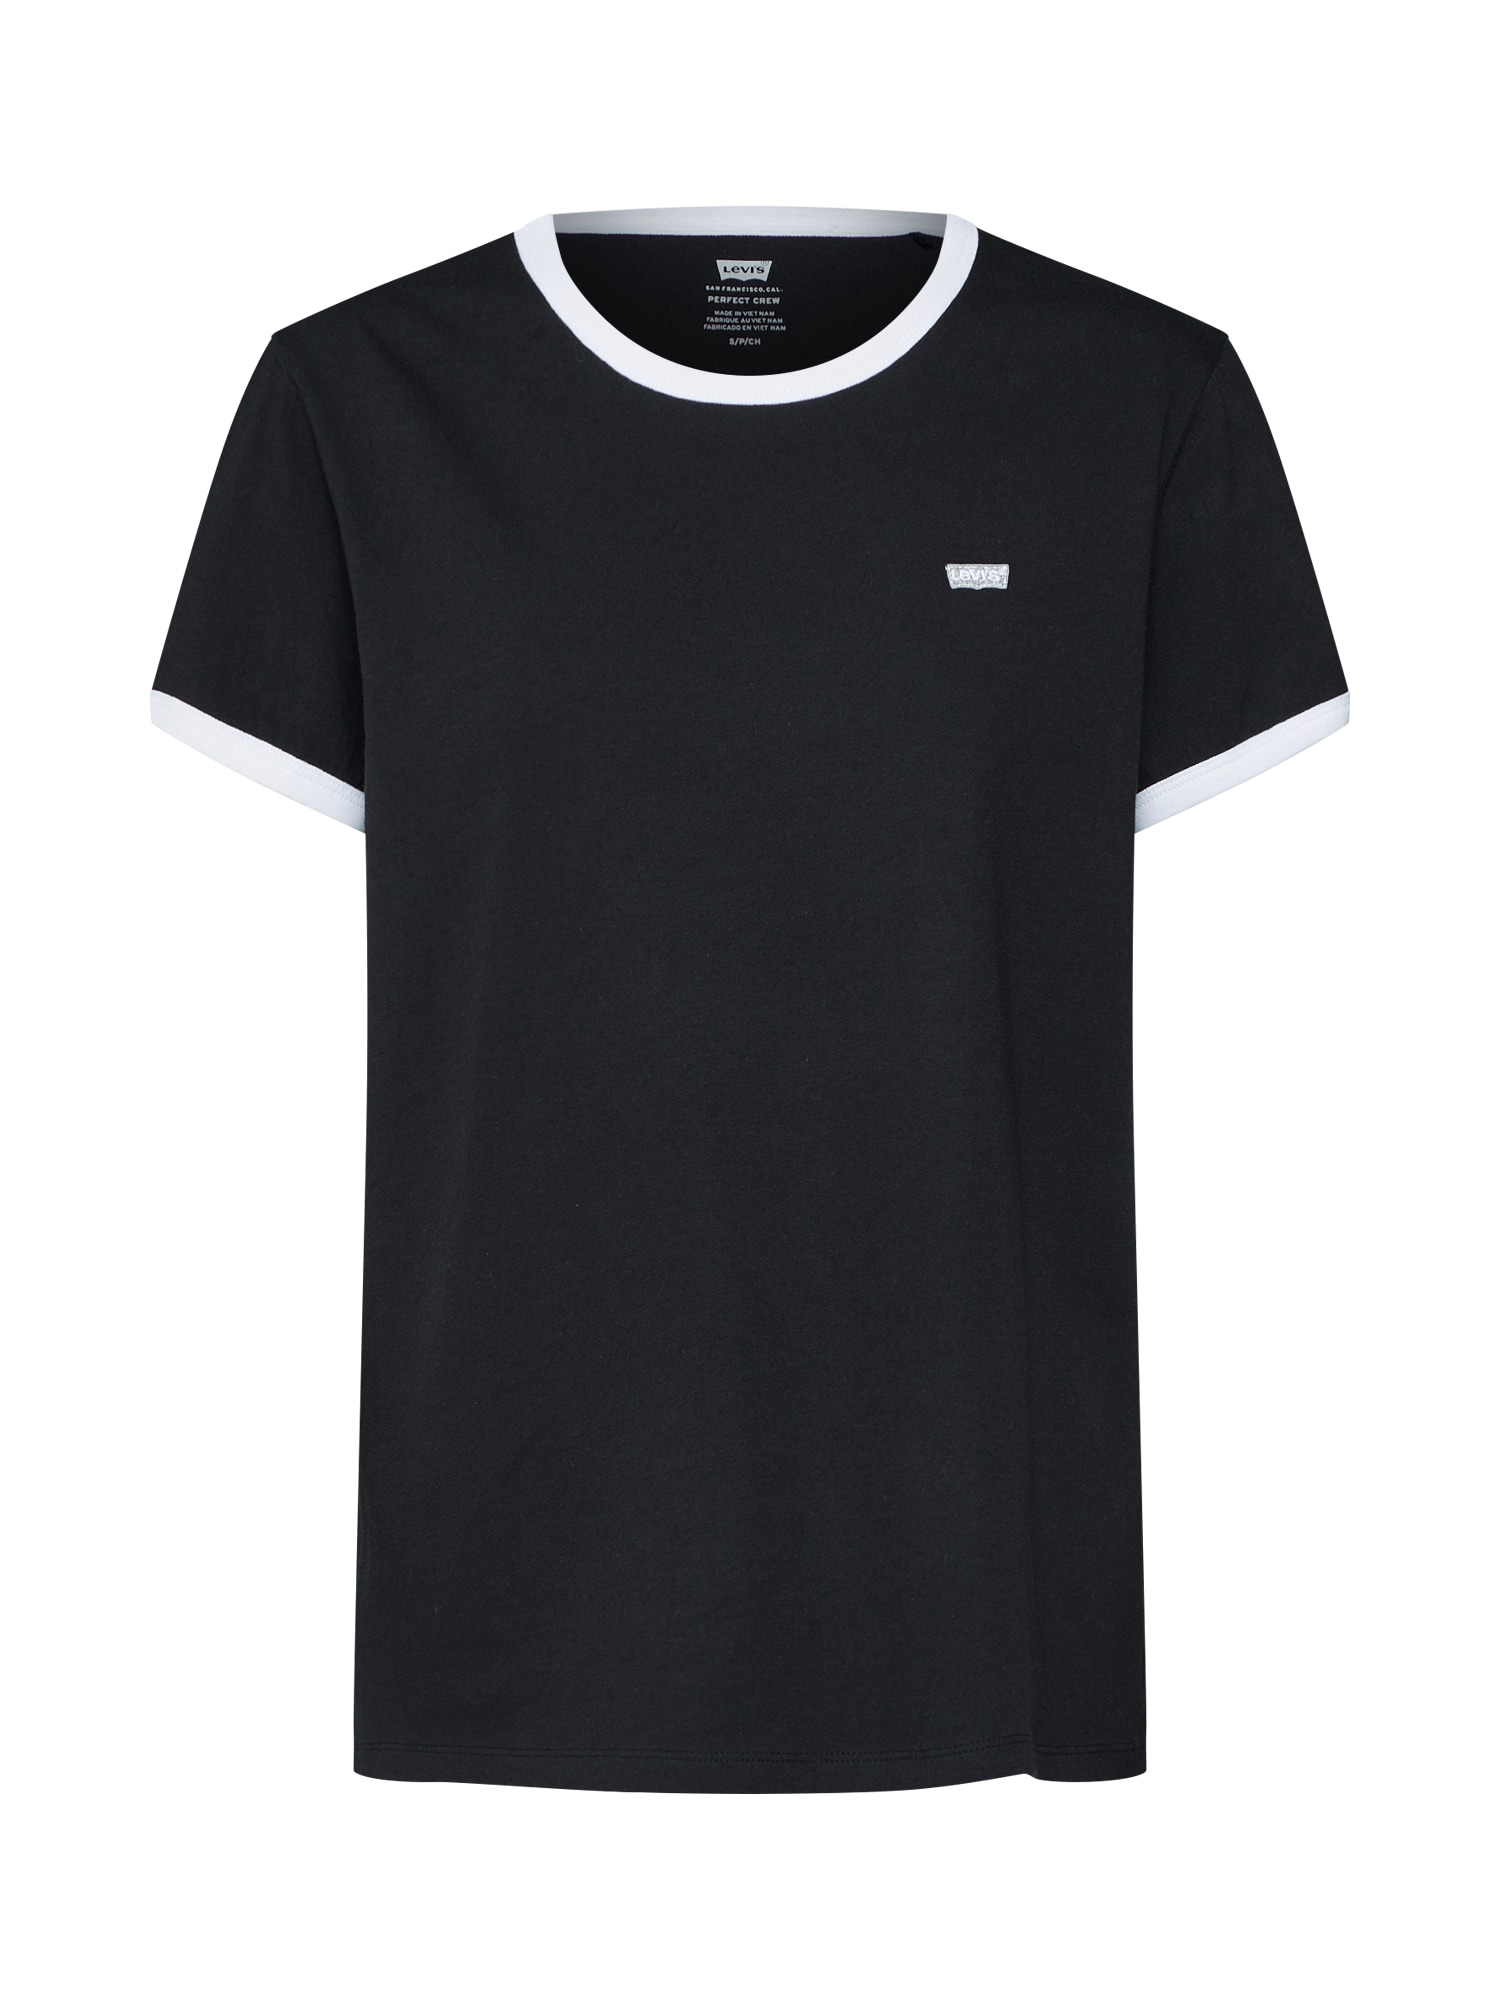 LEVIS Tričko Perf Non-Gaphic Ringer černá bílá LEVI'S